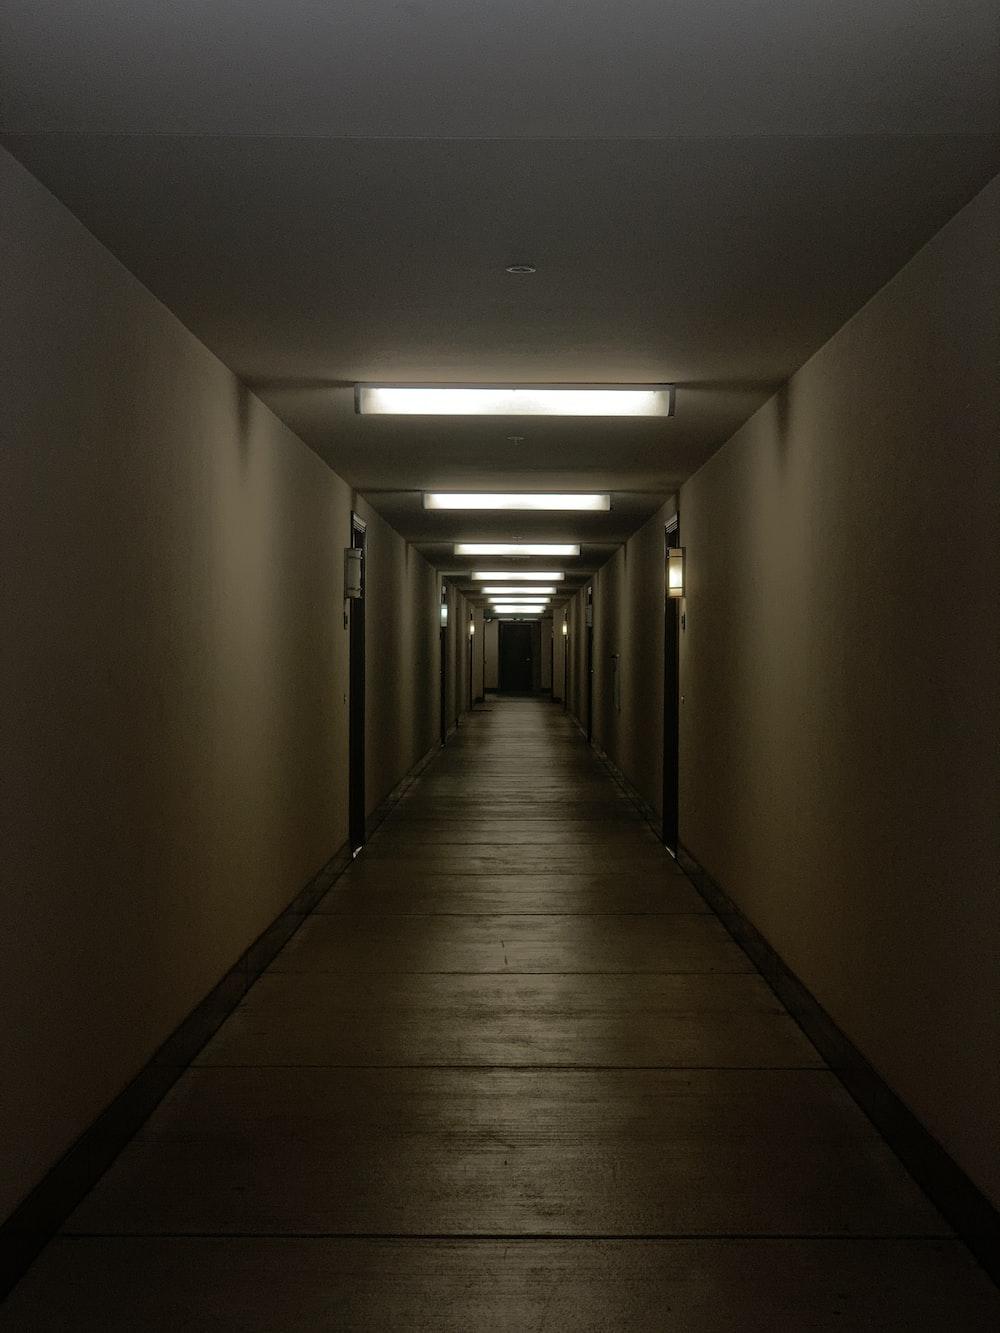 brown hallway